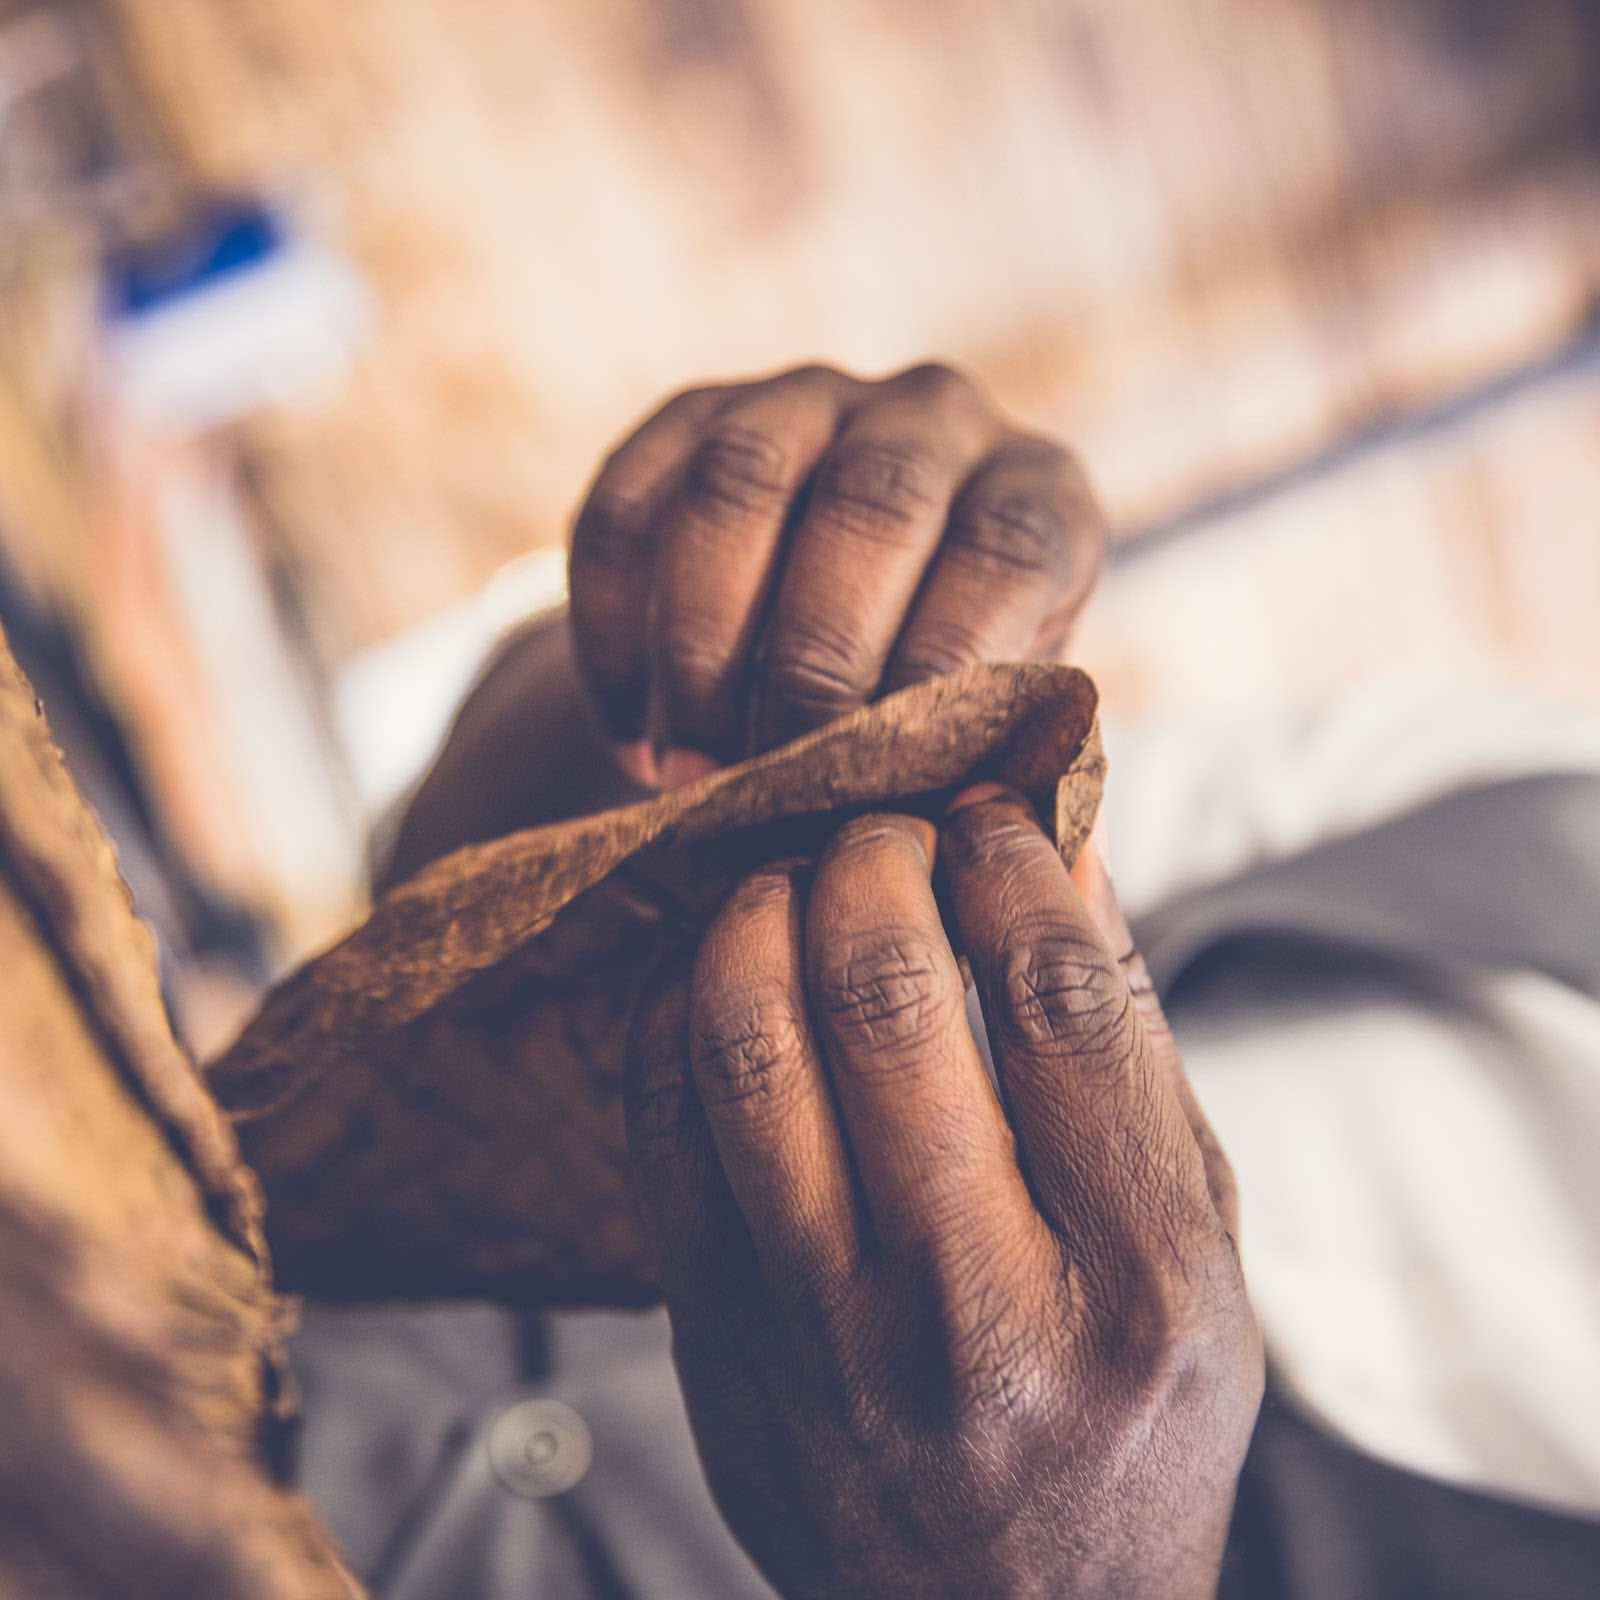 Zigarrendreher | Hamburg | Zigarrenroller | Zigarrenrollerin | Trocadero | Kaufen | Shop | Buchen | Mieten | Handgemacht | Zigarren | Churchill | Robusto | Corona | Robusto | Banderole | Bauchbinde | drehen | Tabak | Cuba | Brasilien